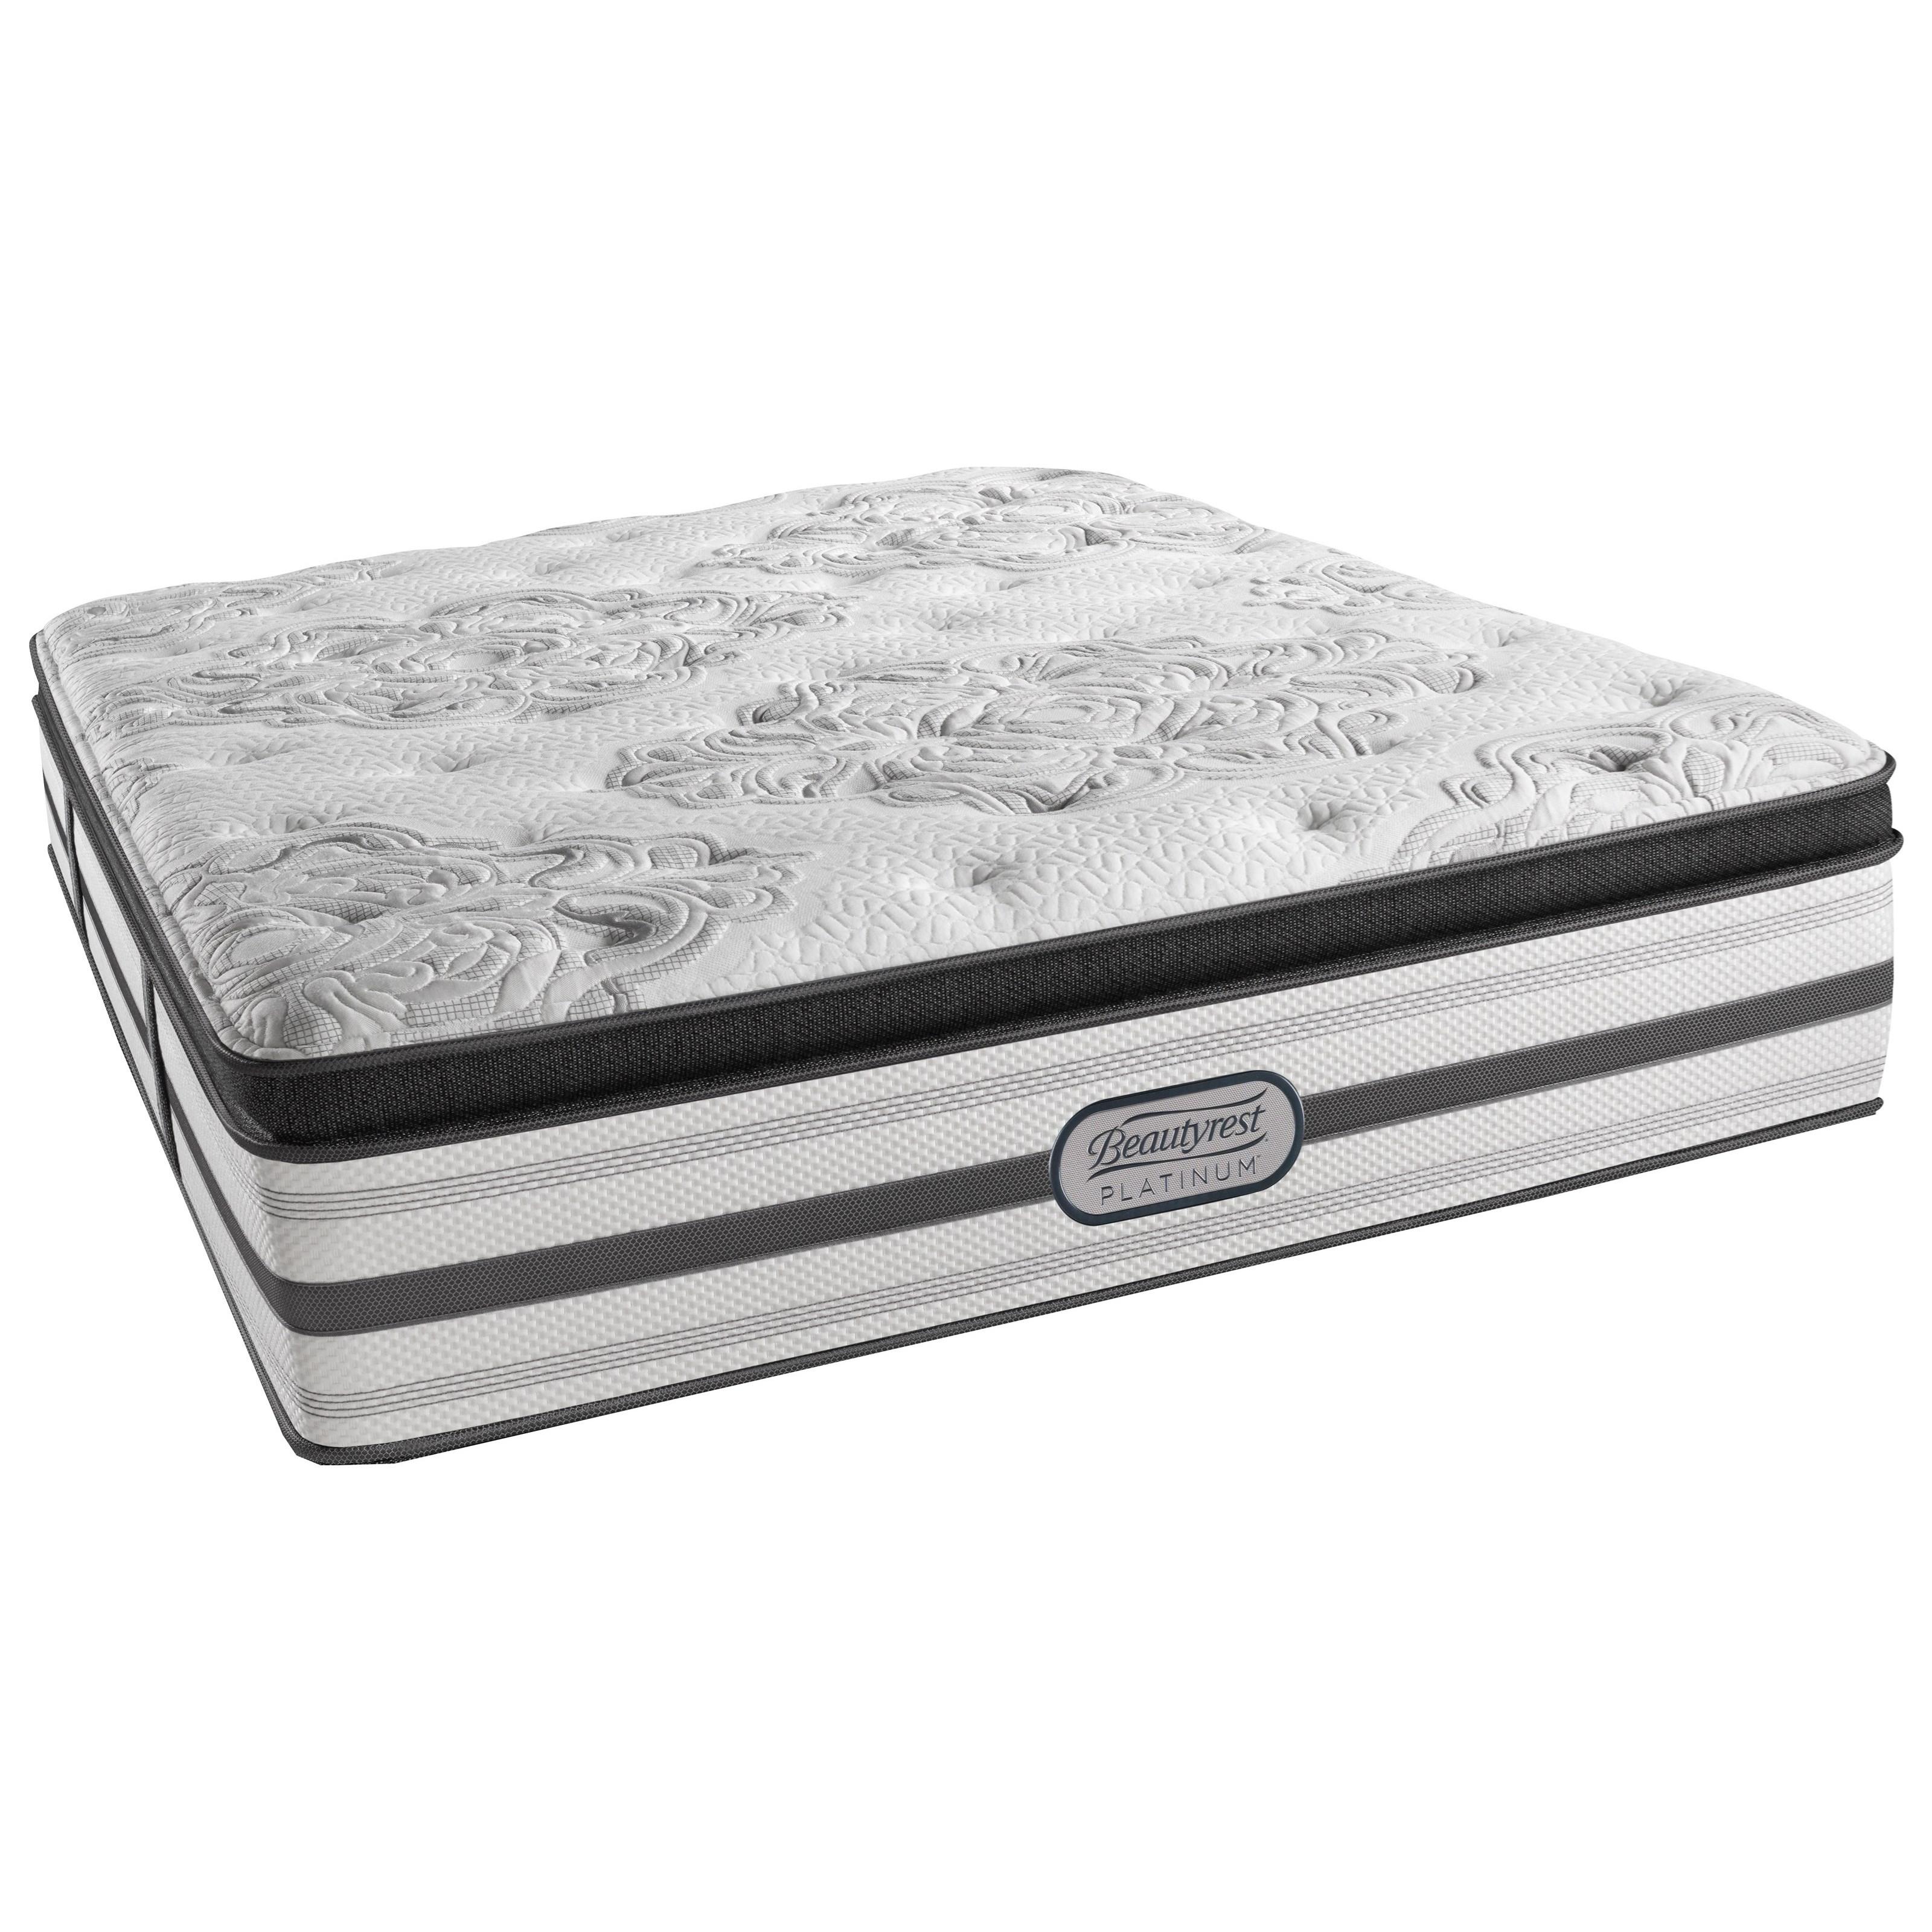 Beautyrest Platinum Gabriella Cal King Plush Pillow Top Adjustable Set - Item Number: LV3PLPT-CK+2xSM1-SPCK